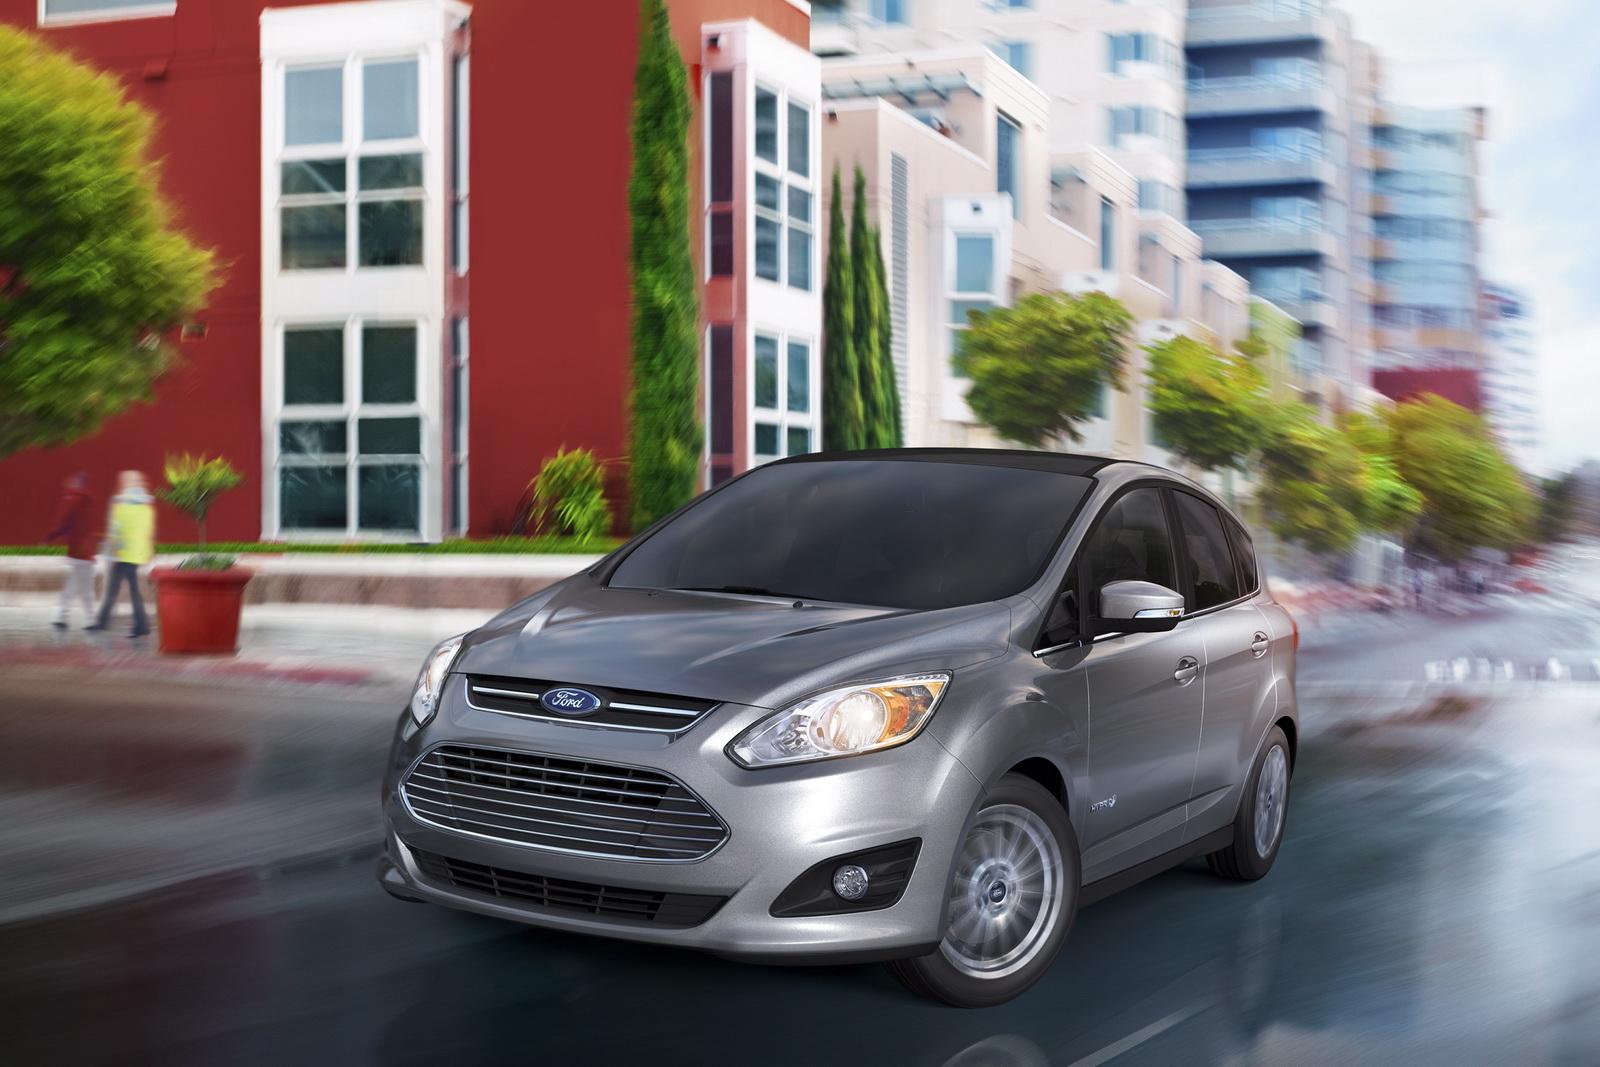 Ford C-Max ibrida e Ford Focus Electric